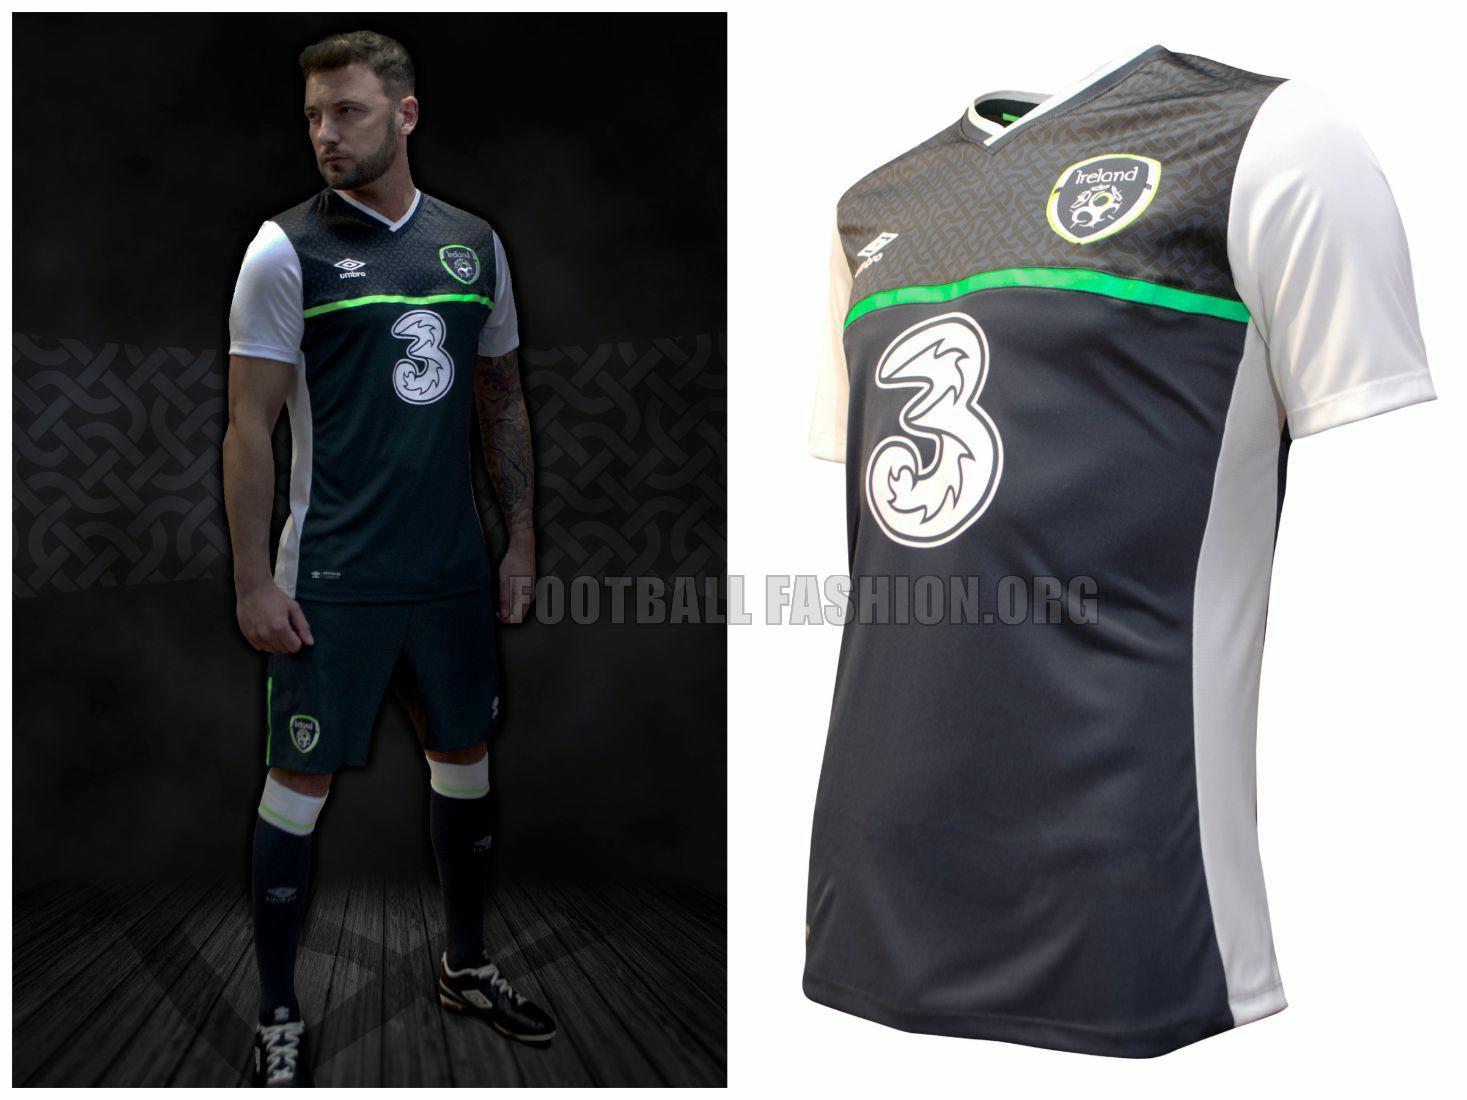 4ba73b6a7fc Republic of Ireland 2015 2016 Umbro Away Football Kit, Soccer Jersey, Shirt